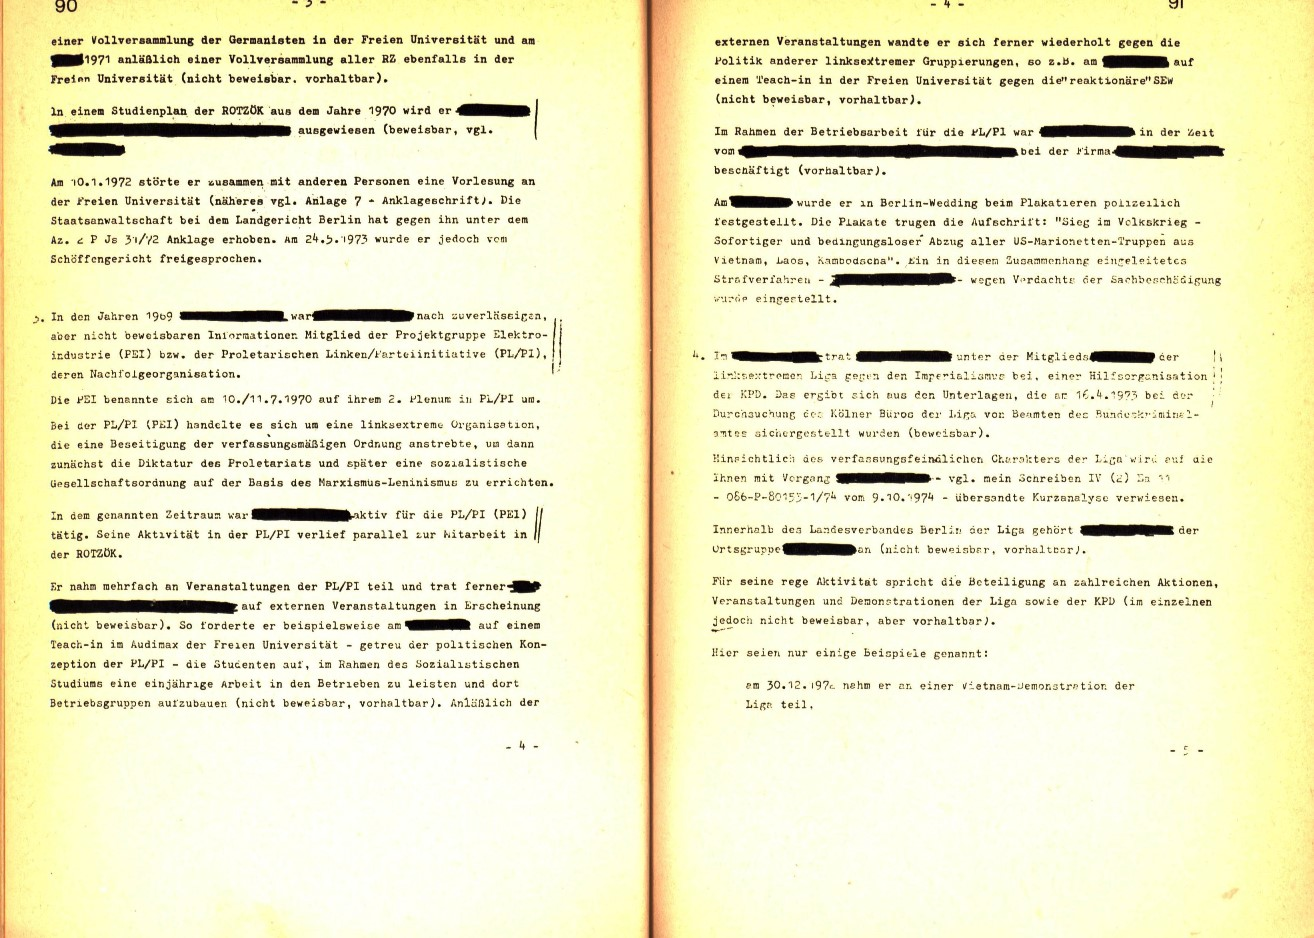 Berlin_VDS_Aktionskomitee_1975_BerufsverboteII_47